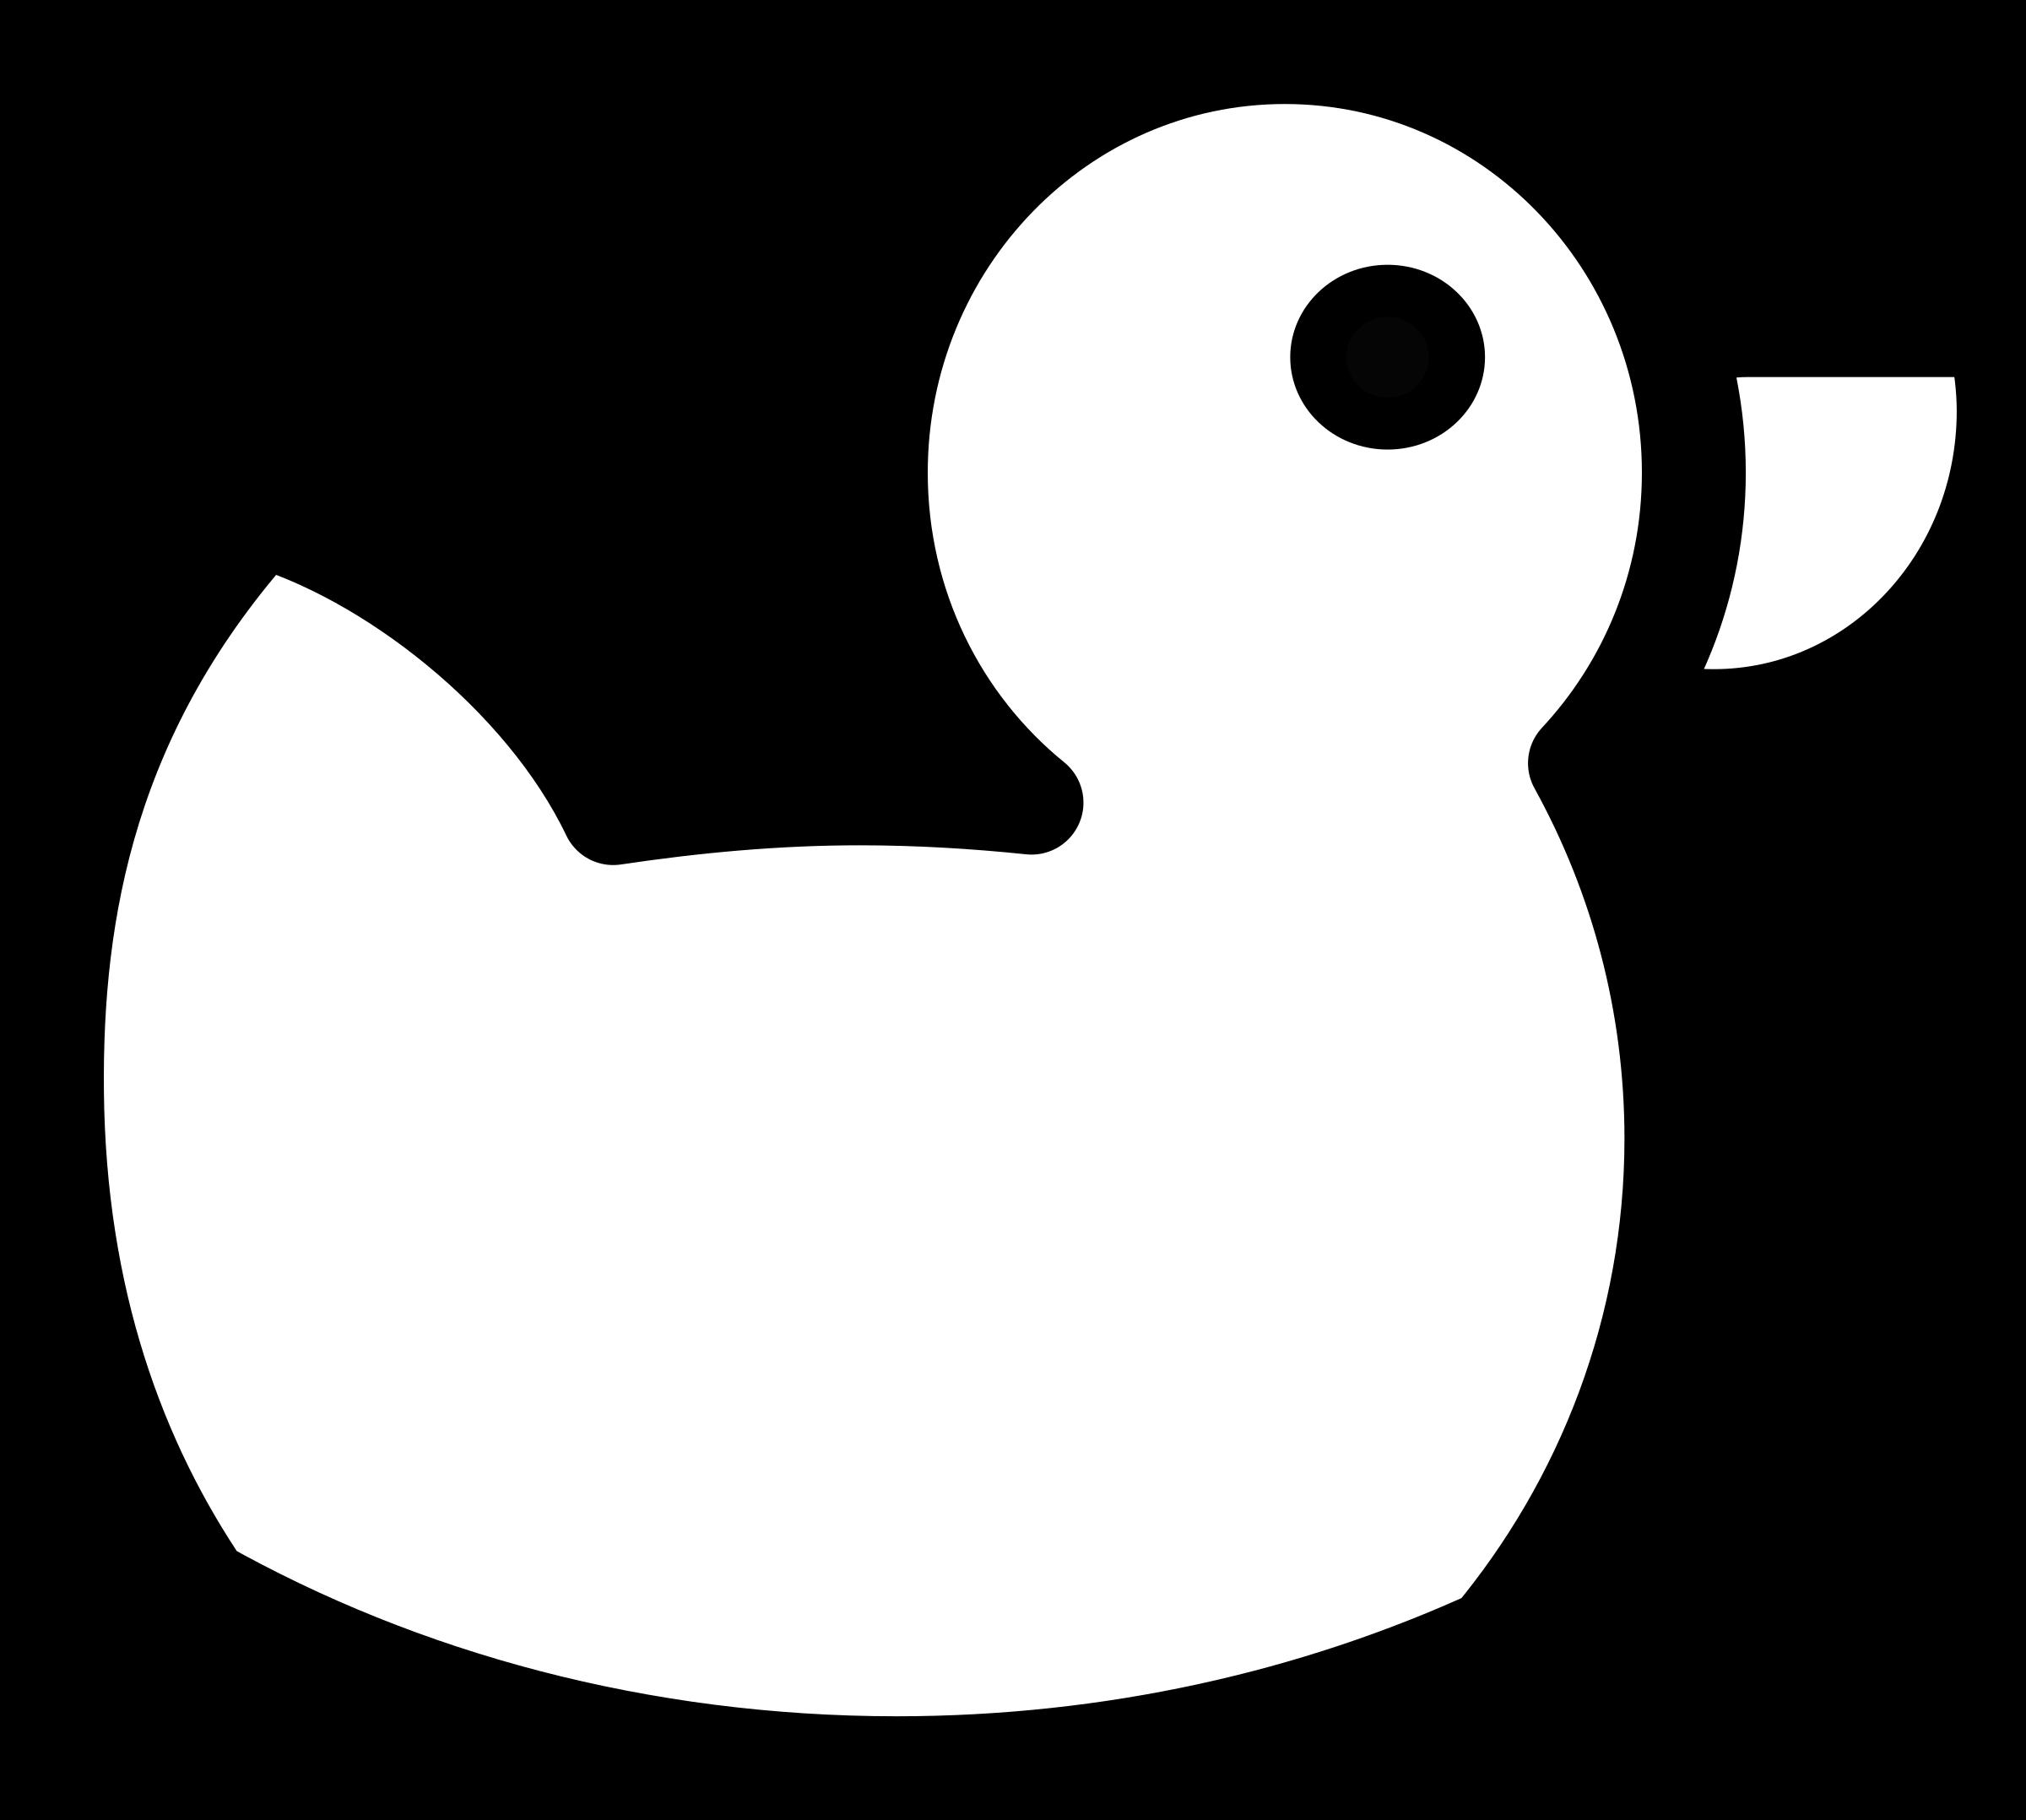 Outline big image png. Ducks clipart purple duck